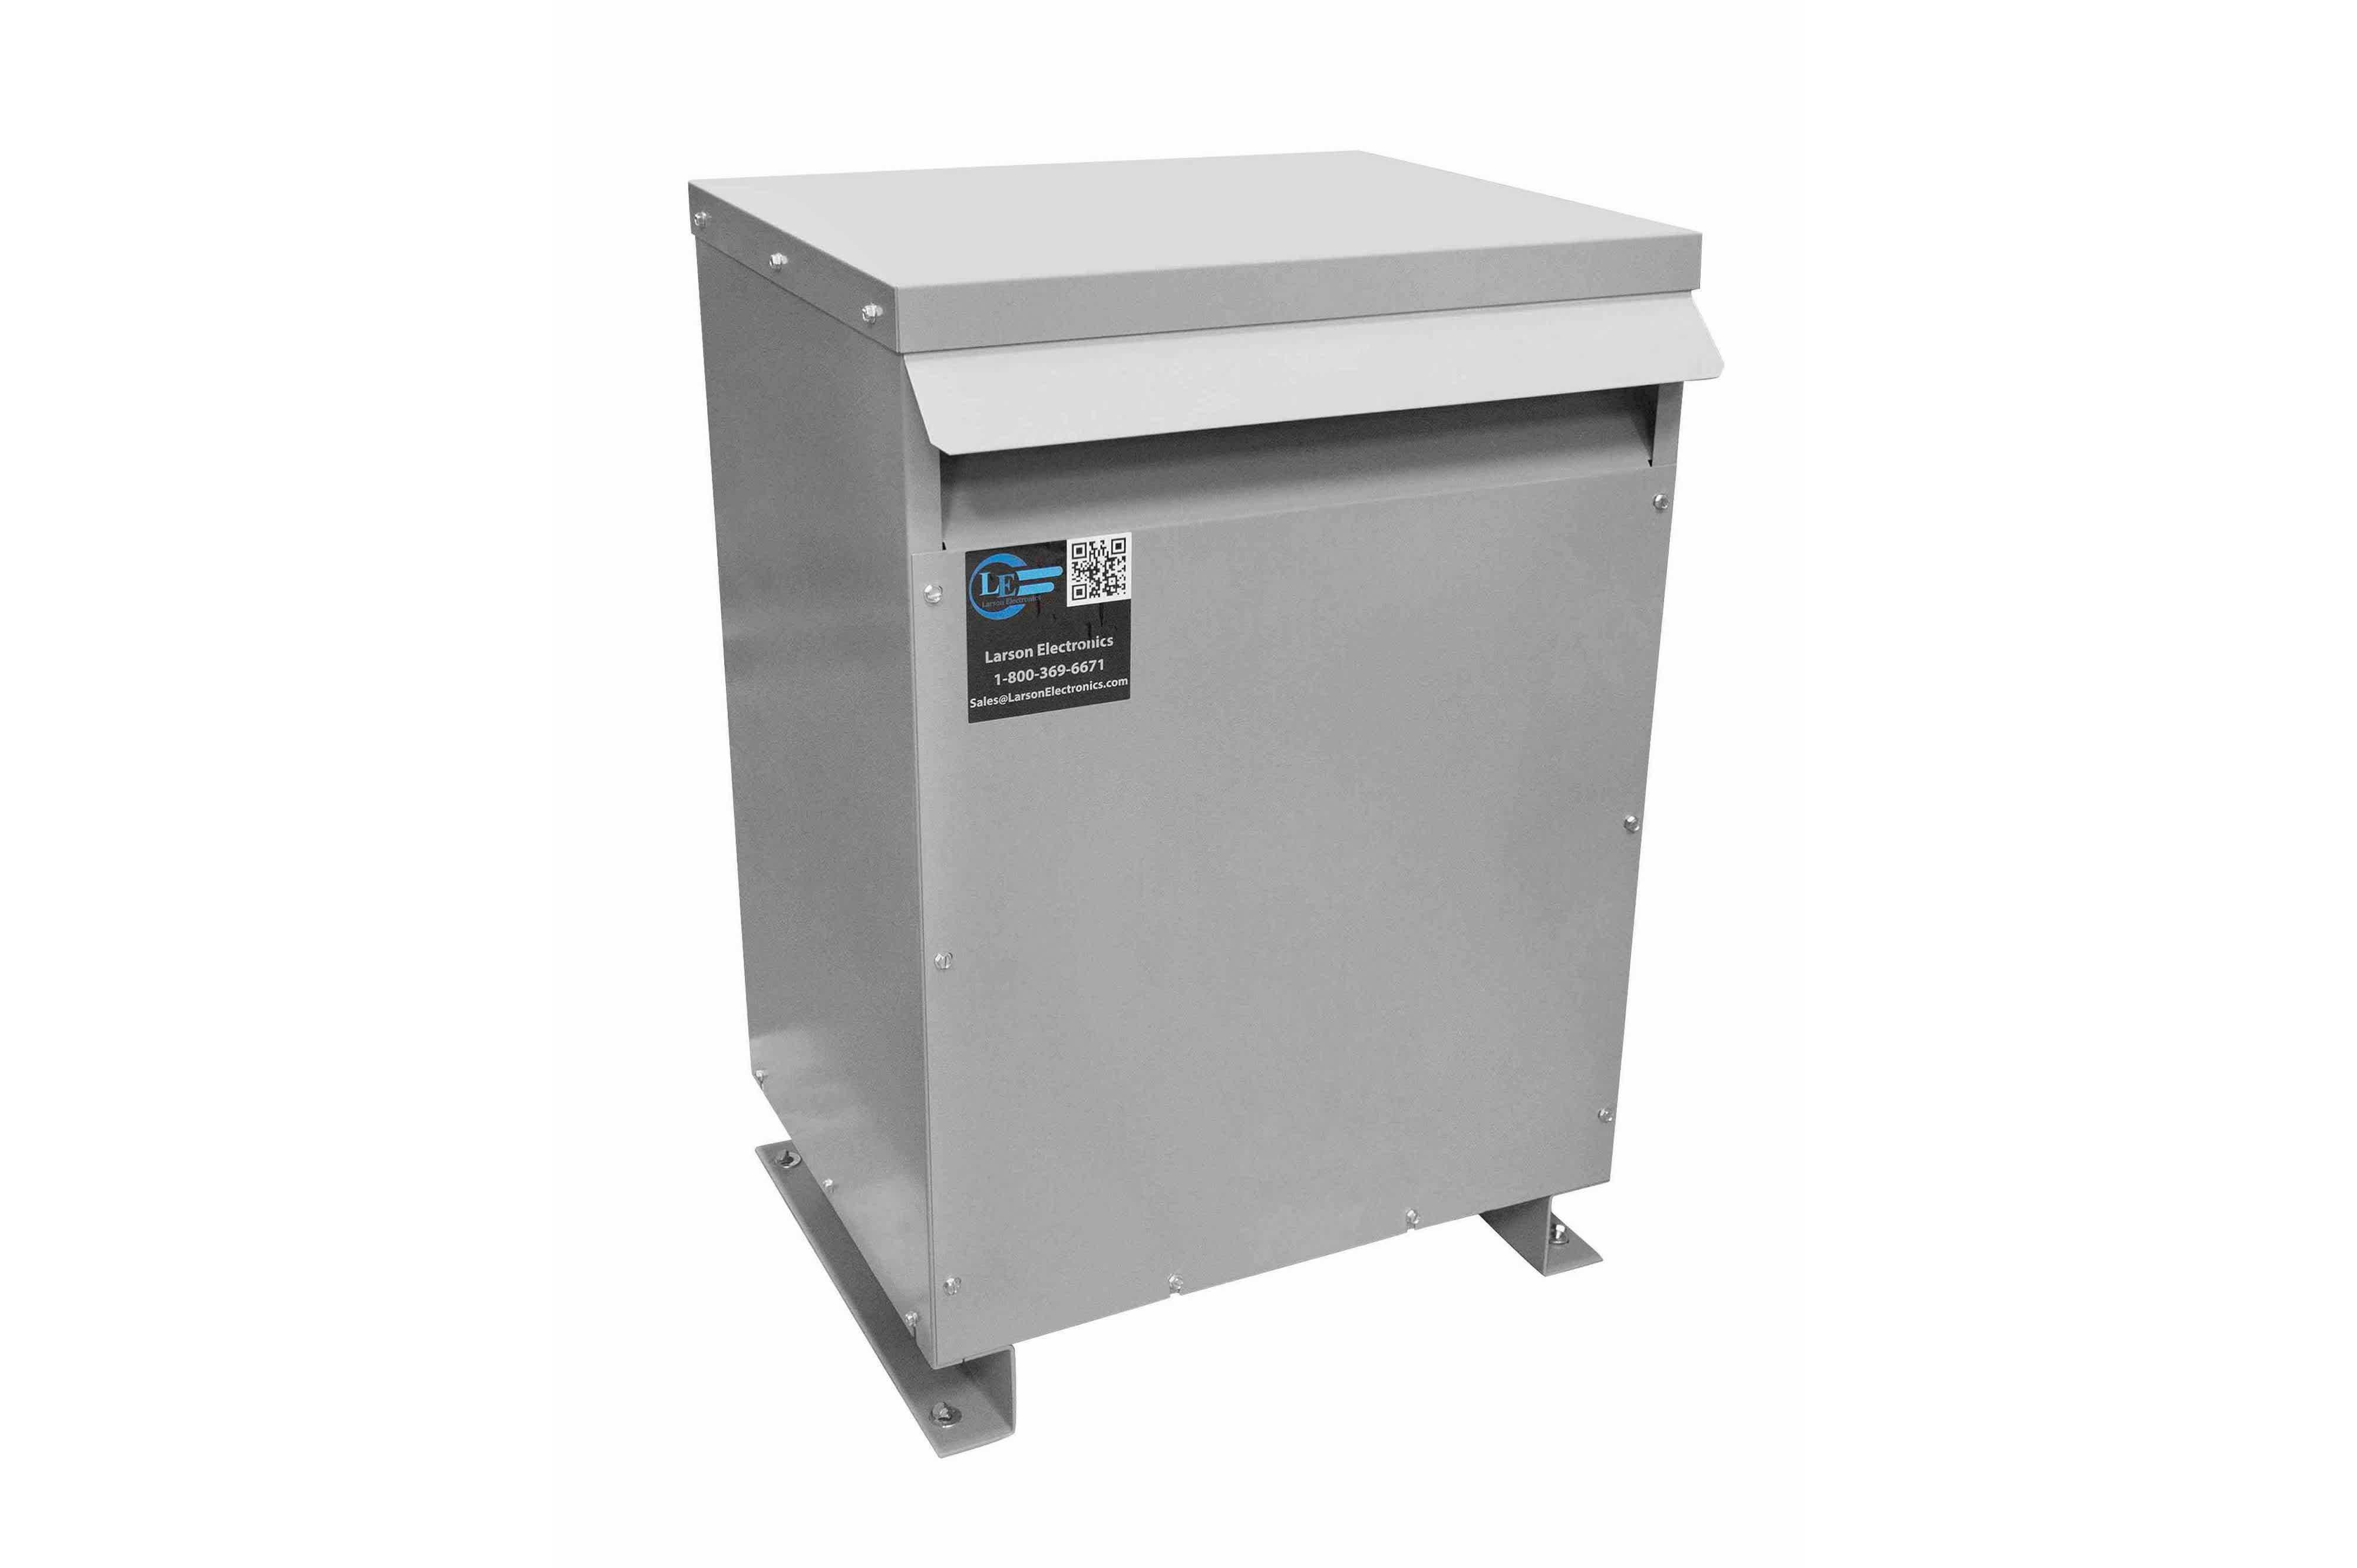 12 kVA 3PH Isolation Transformer, 400V Wye Primary, 240V/120 Delta Secondary, N3R, Ventilated, 60 Hz